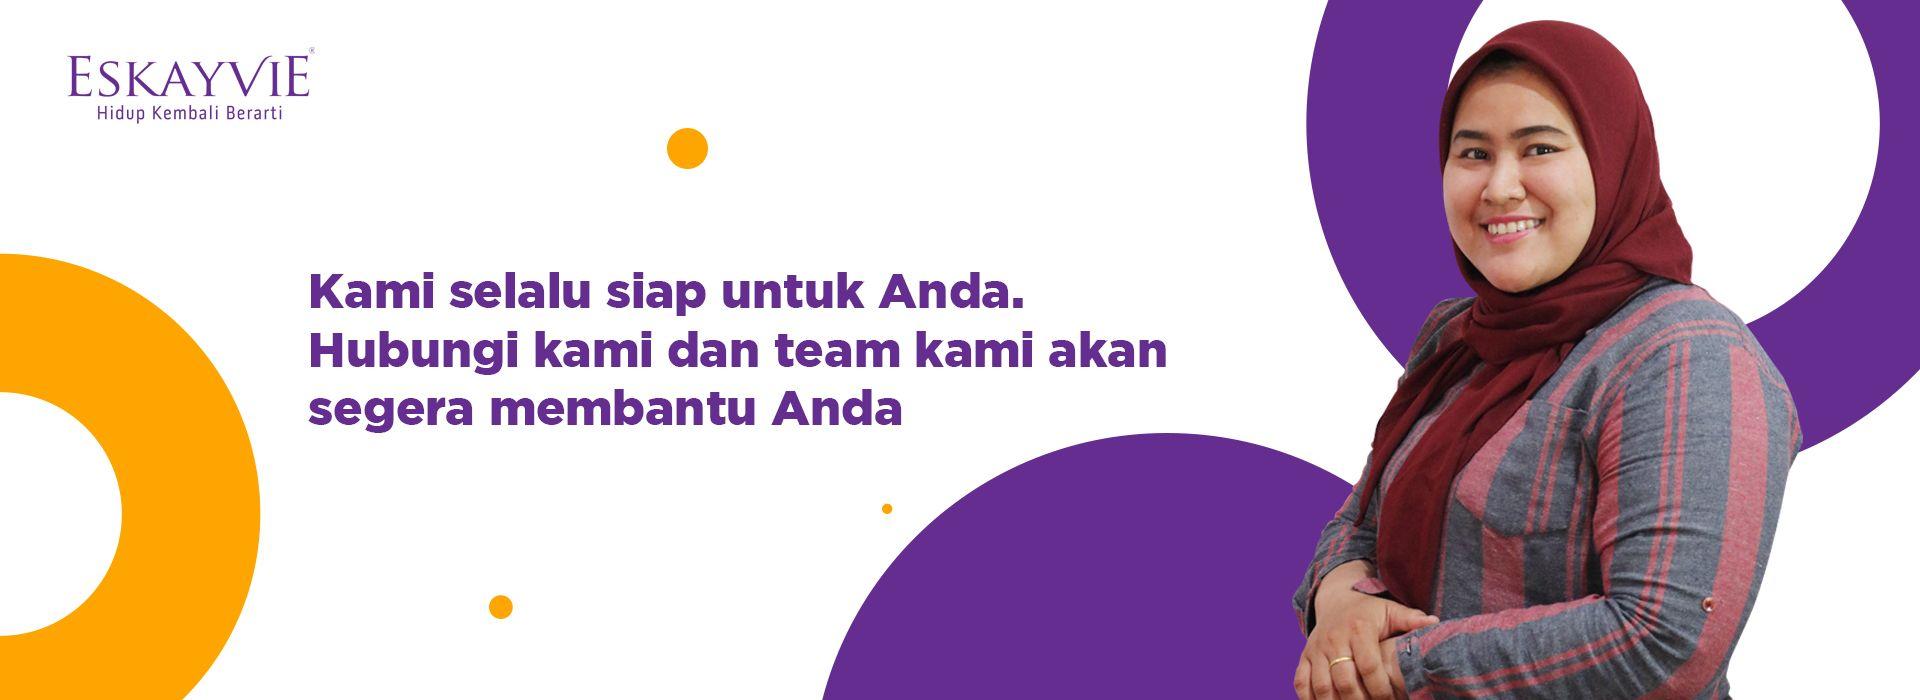 banner kontak hubungi eskayvie indonesia